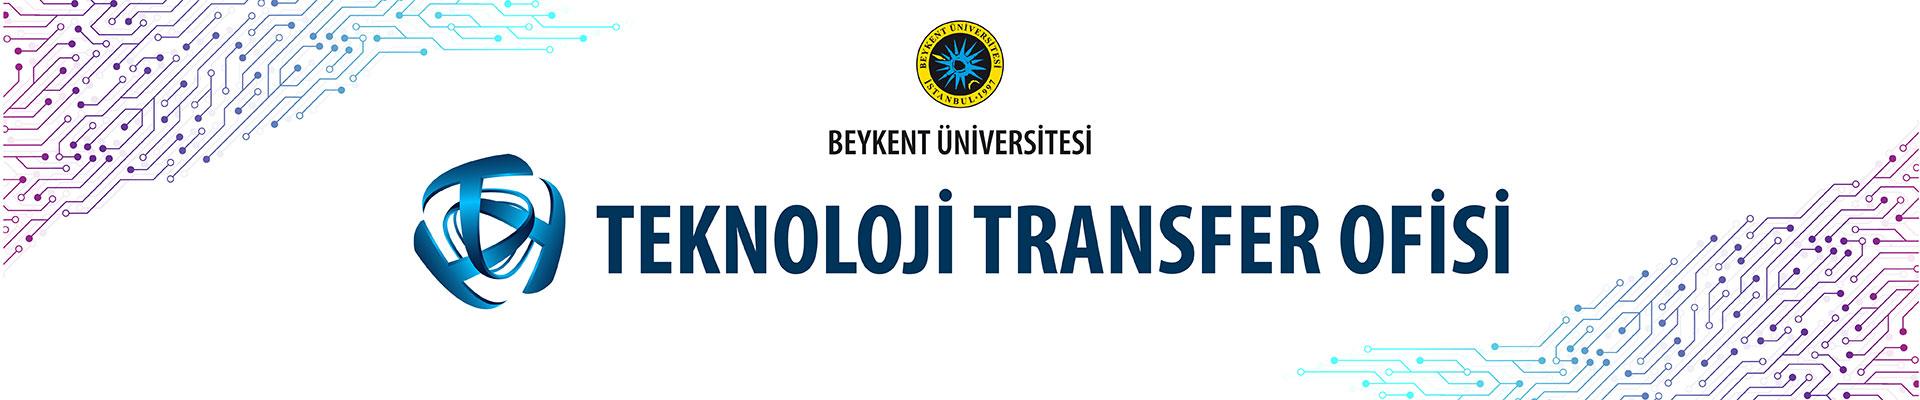 Teknoloji Transfer Ofisi (TTO)